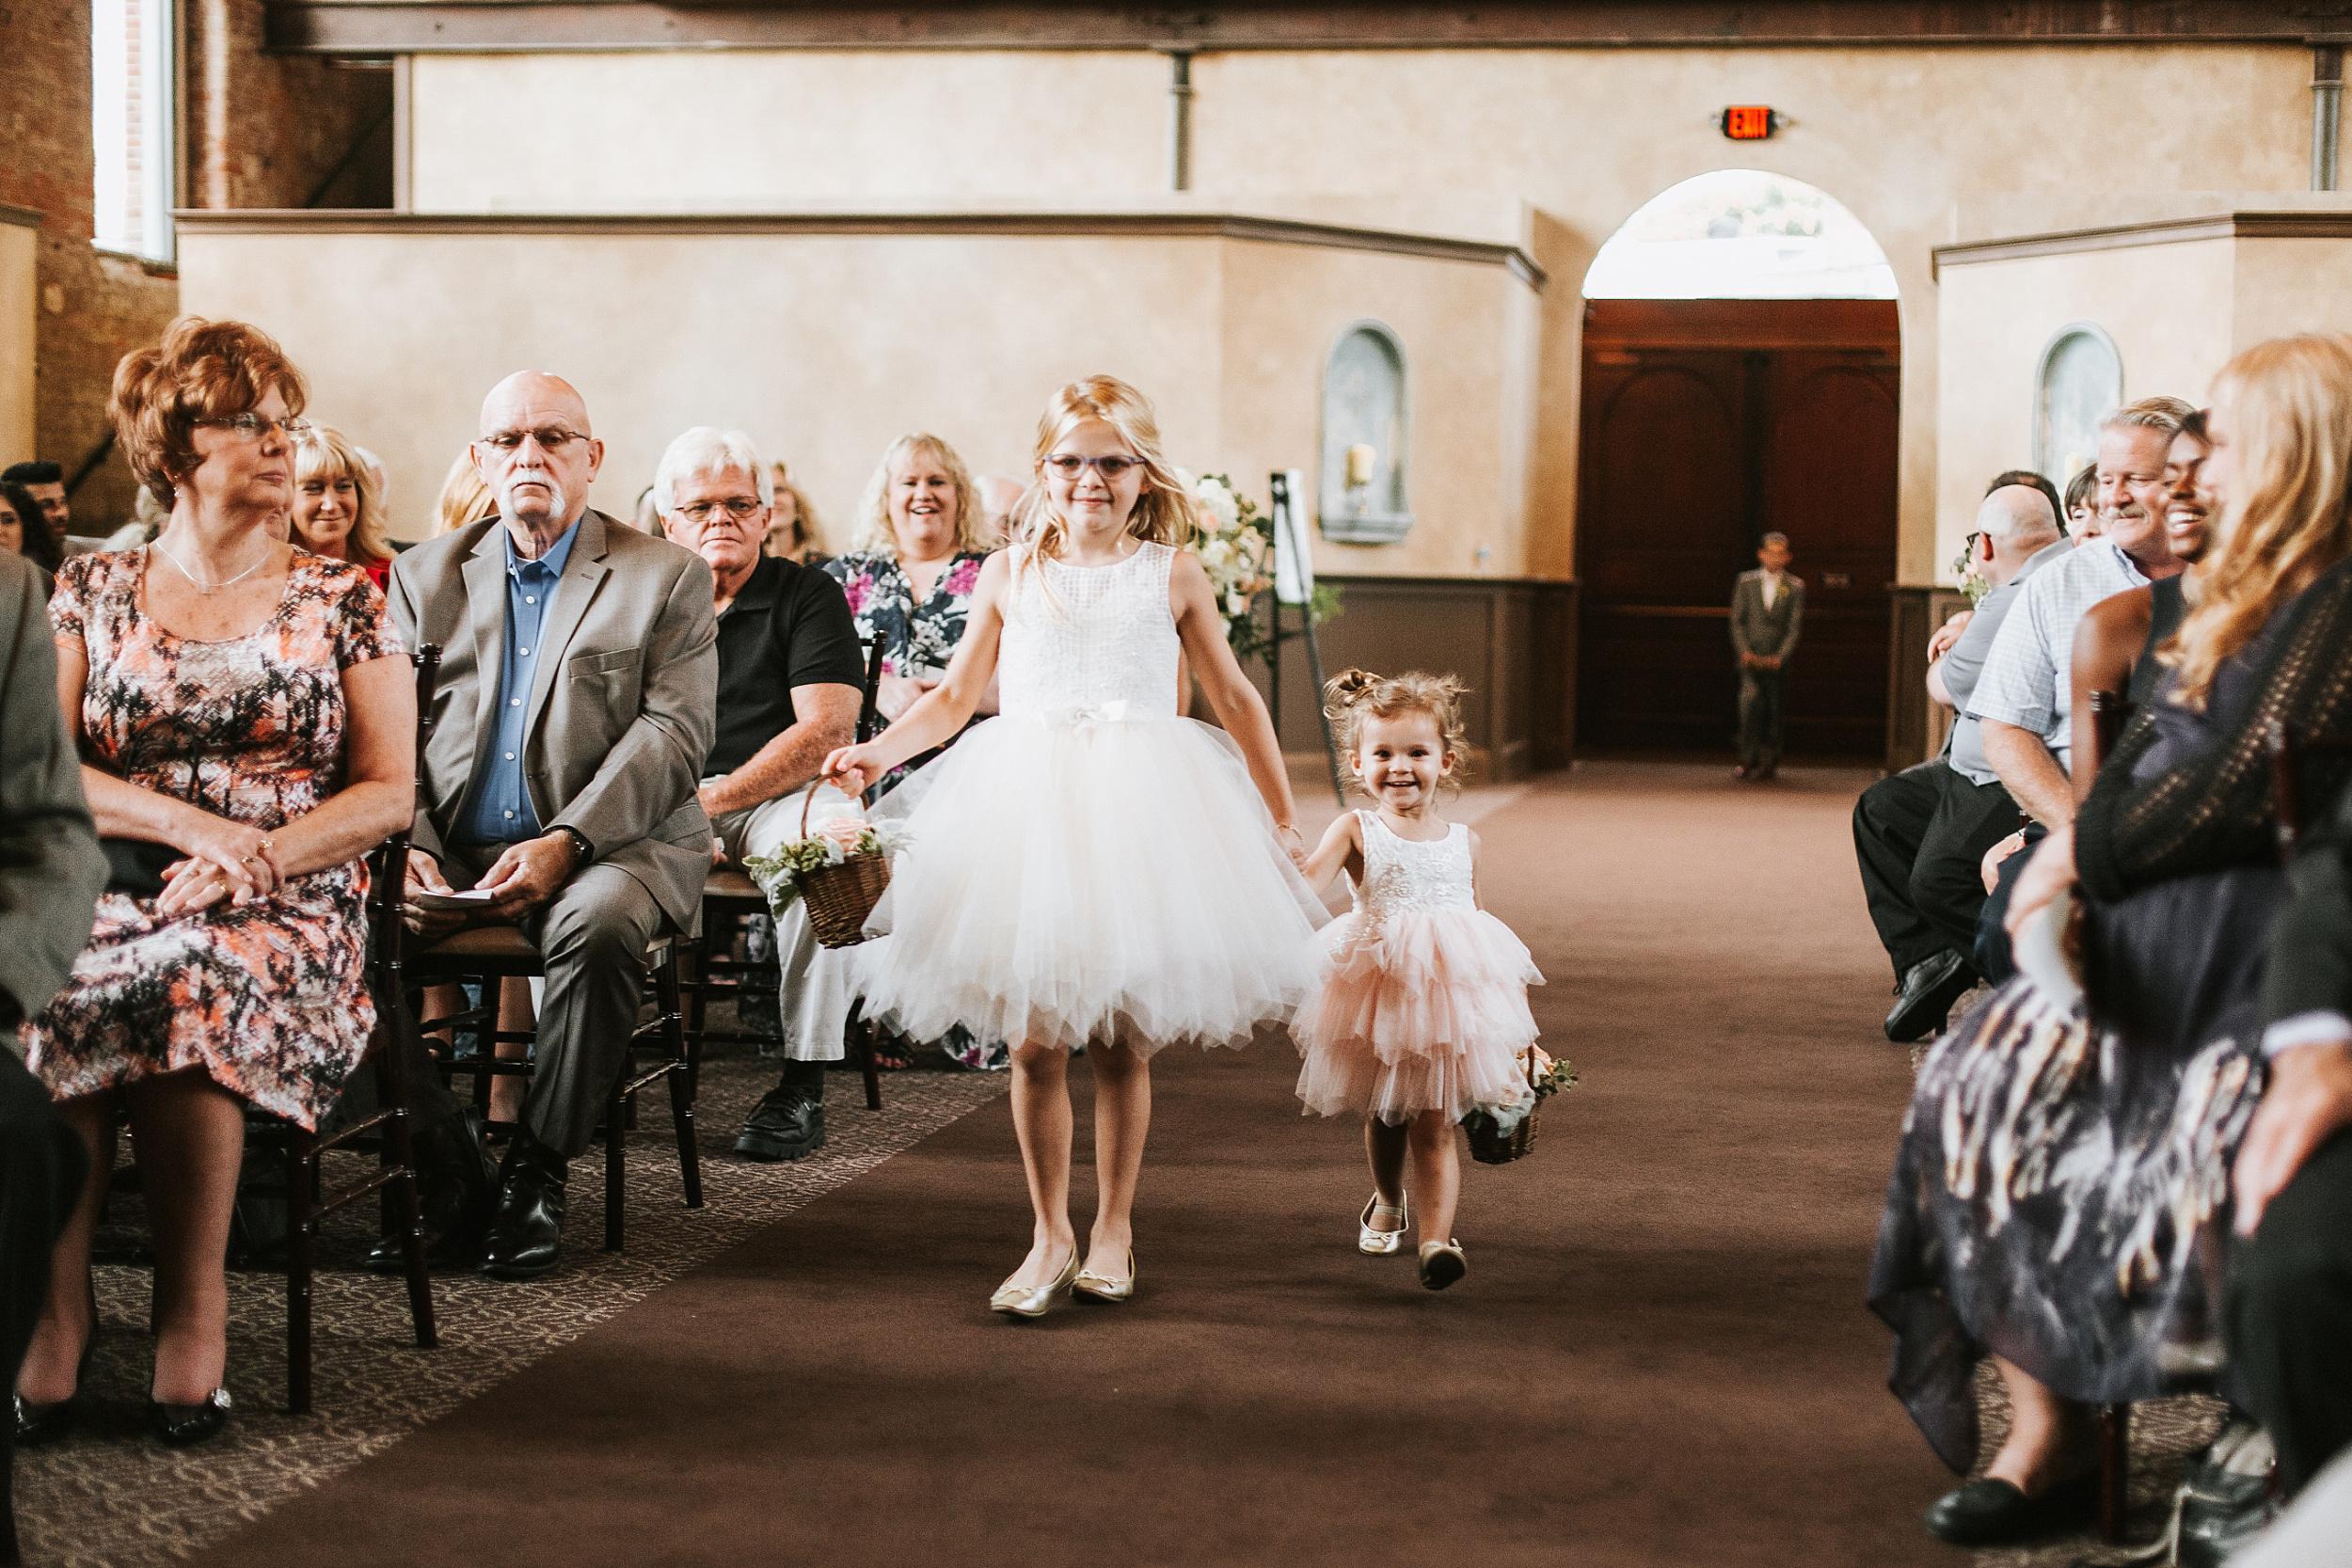 Brooke Townsend Photography - Cincinnati Wedding Photographer (102 of 170).jpg